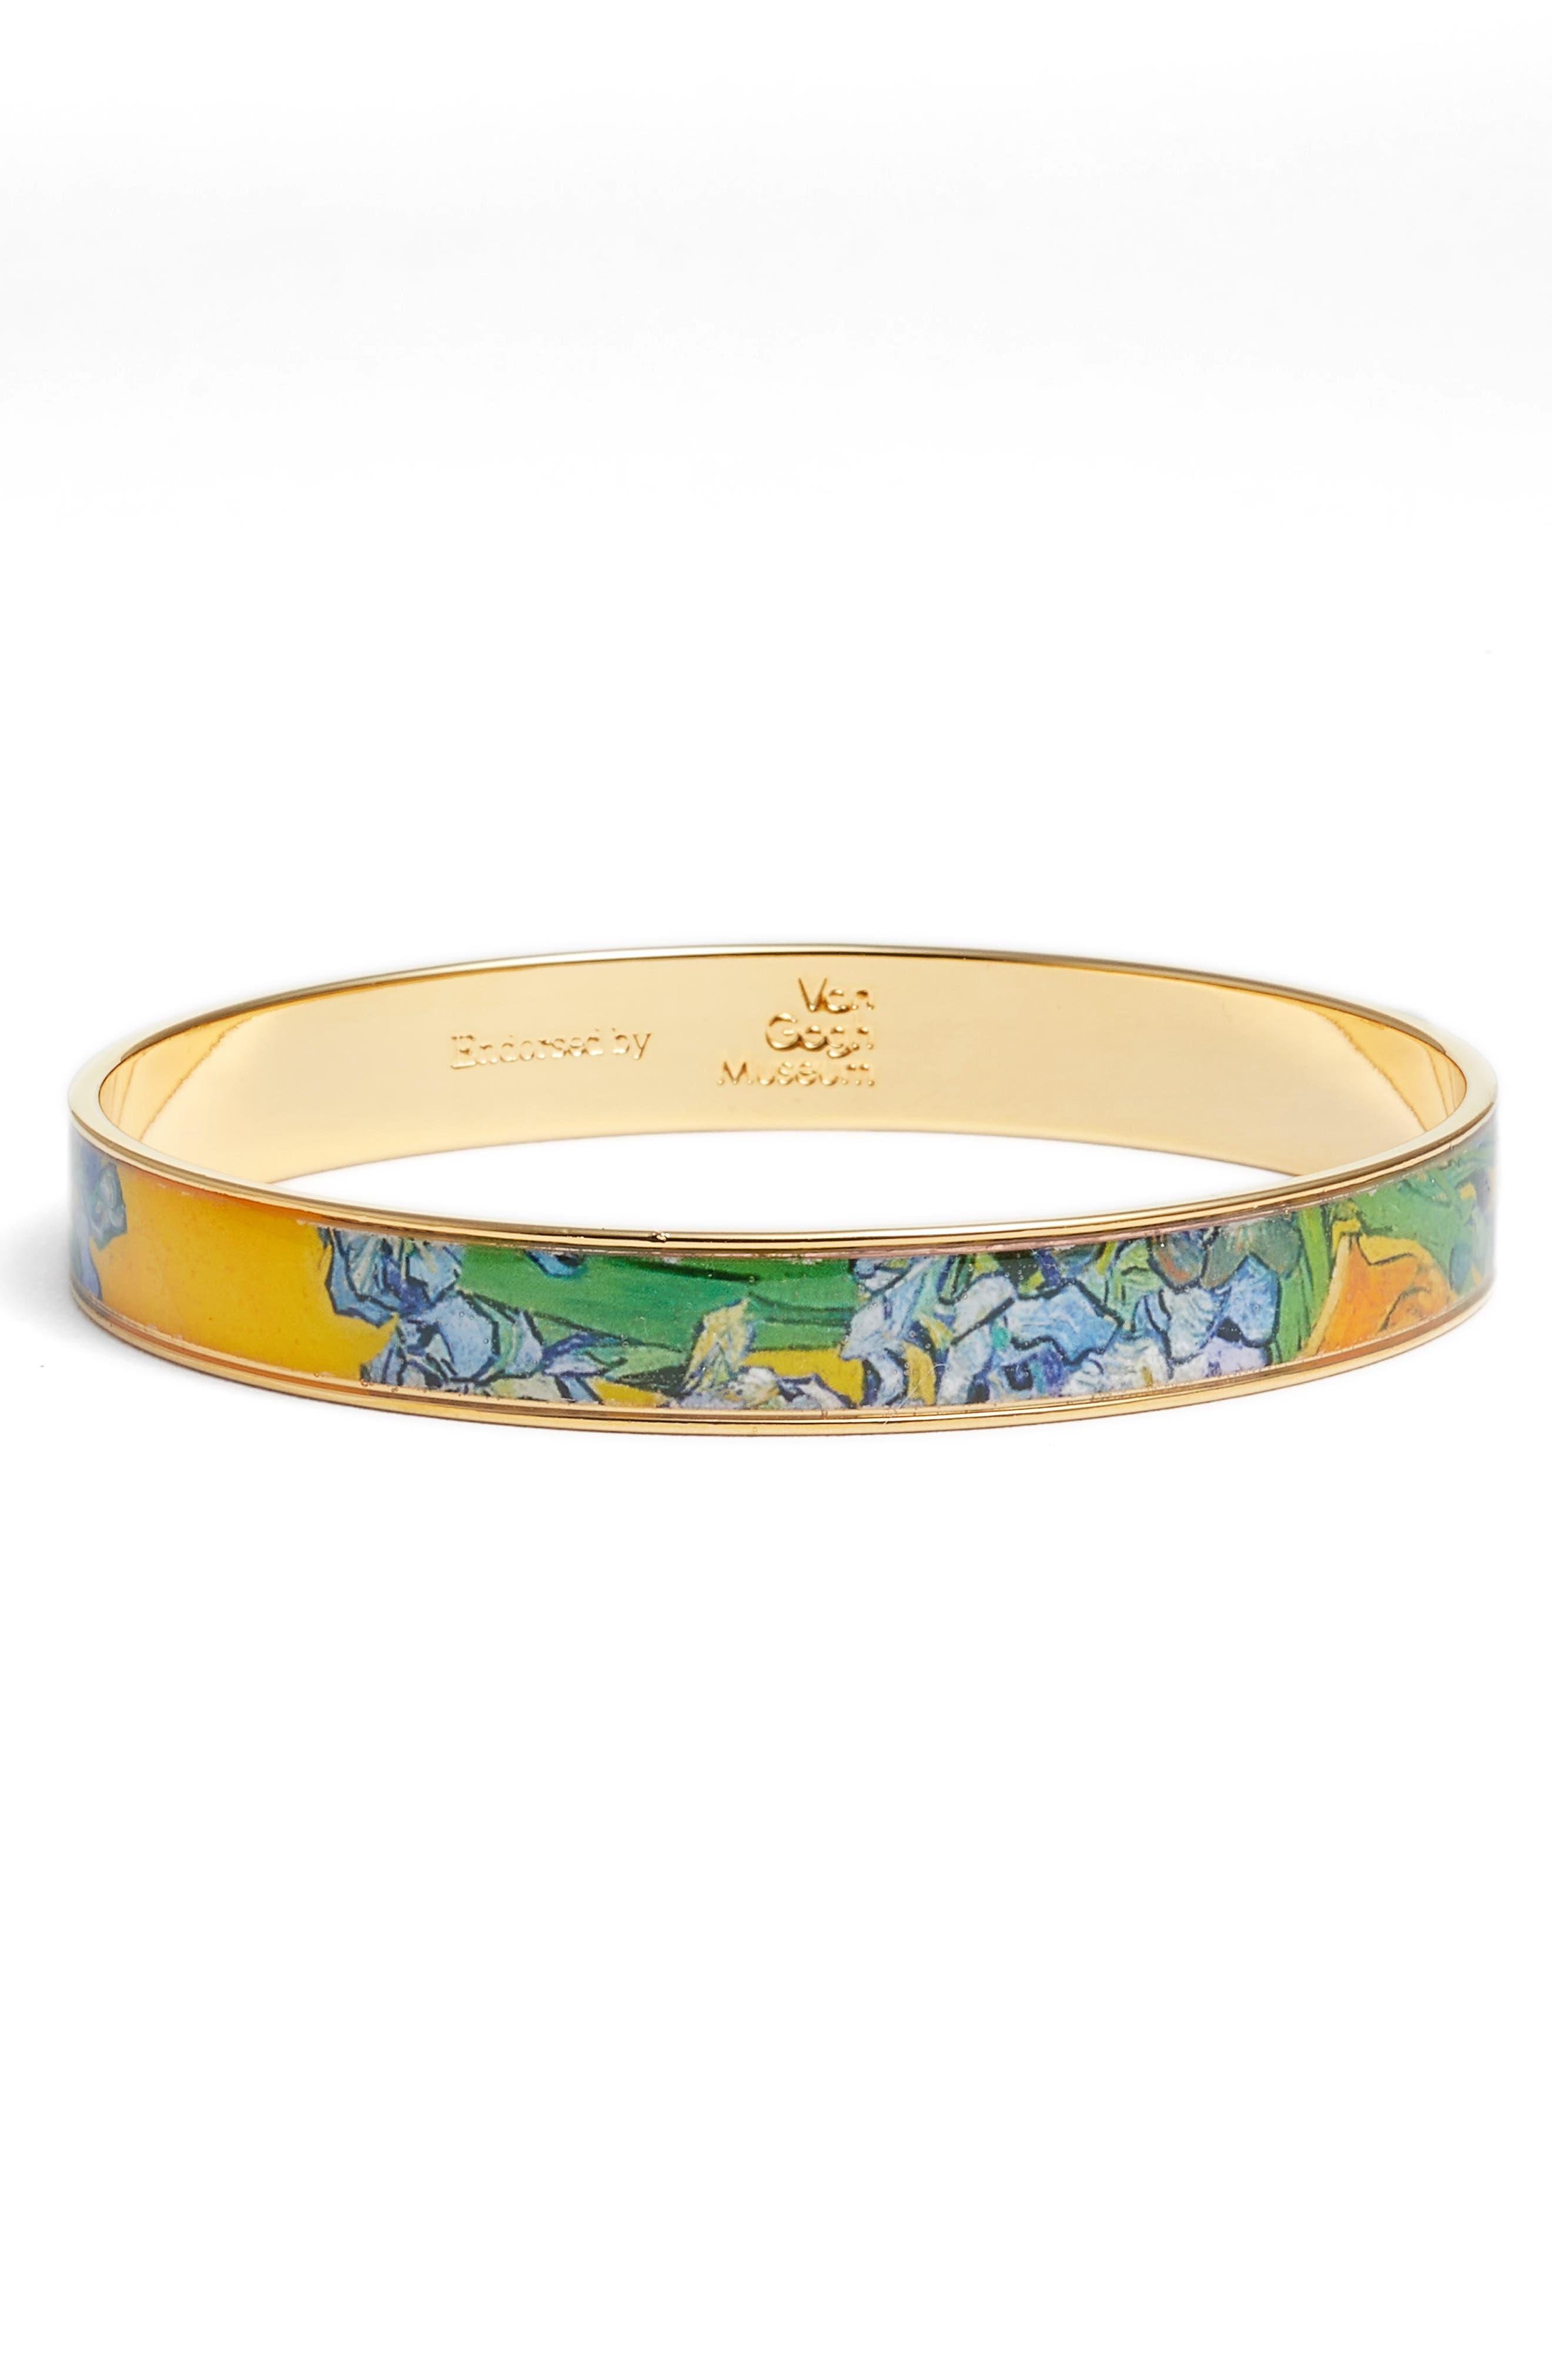 Irises Medium Bangle Bracelet,                         Main,                         color, YELLOW/ GOLD